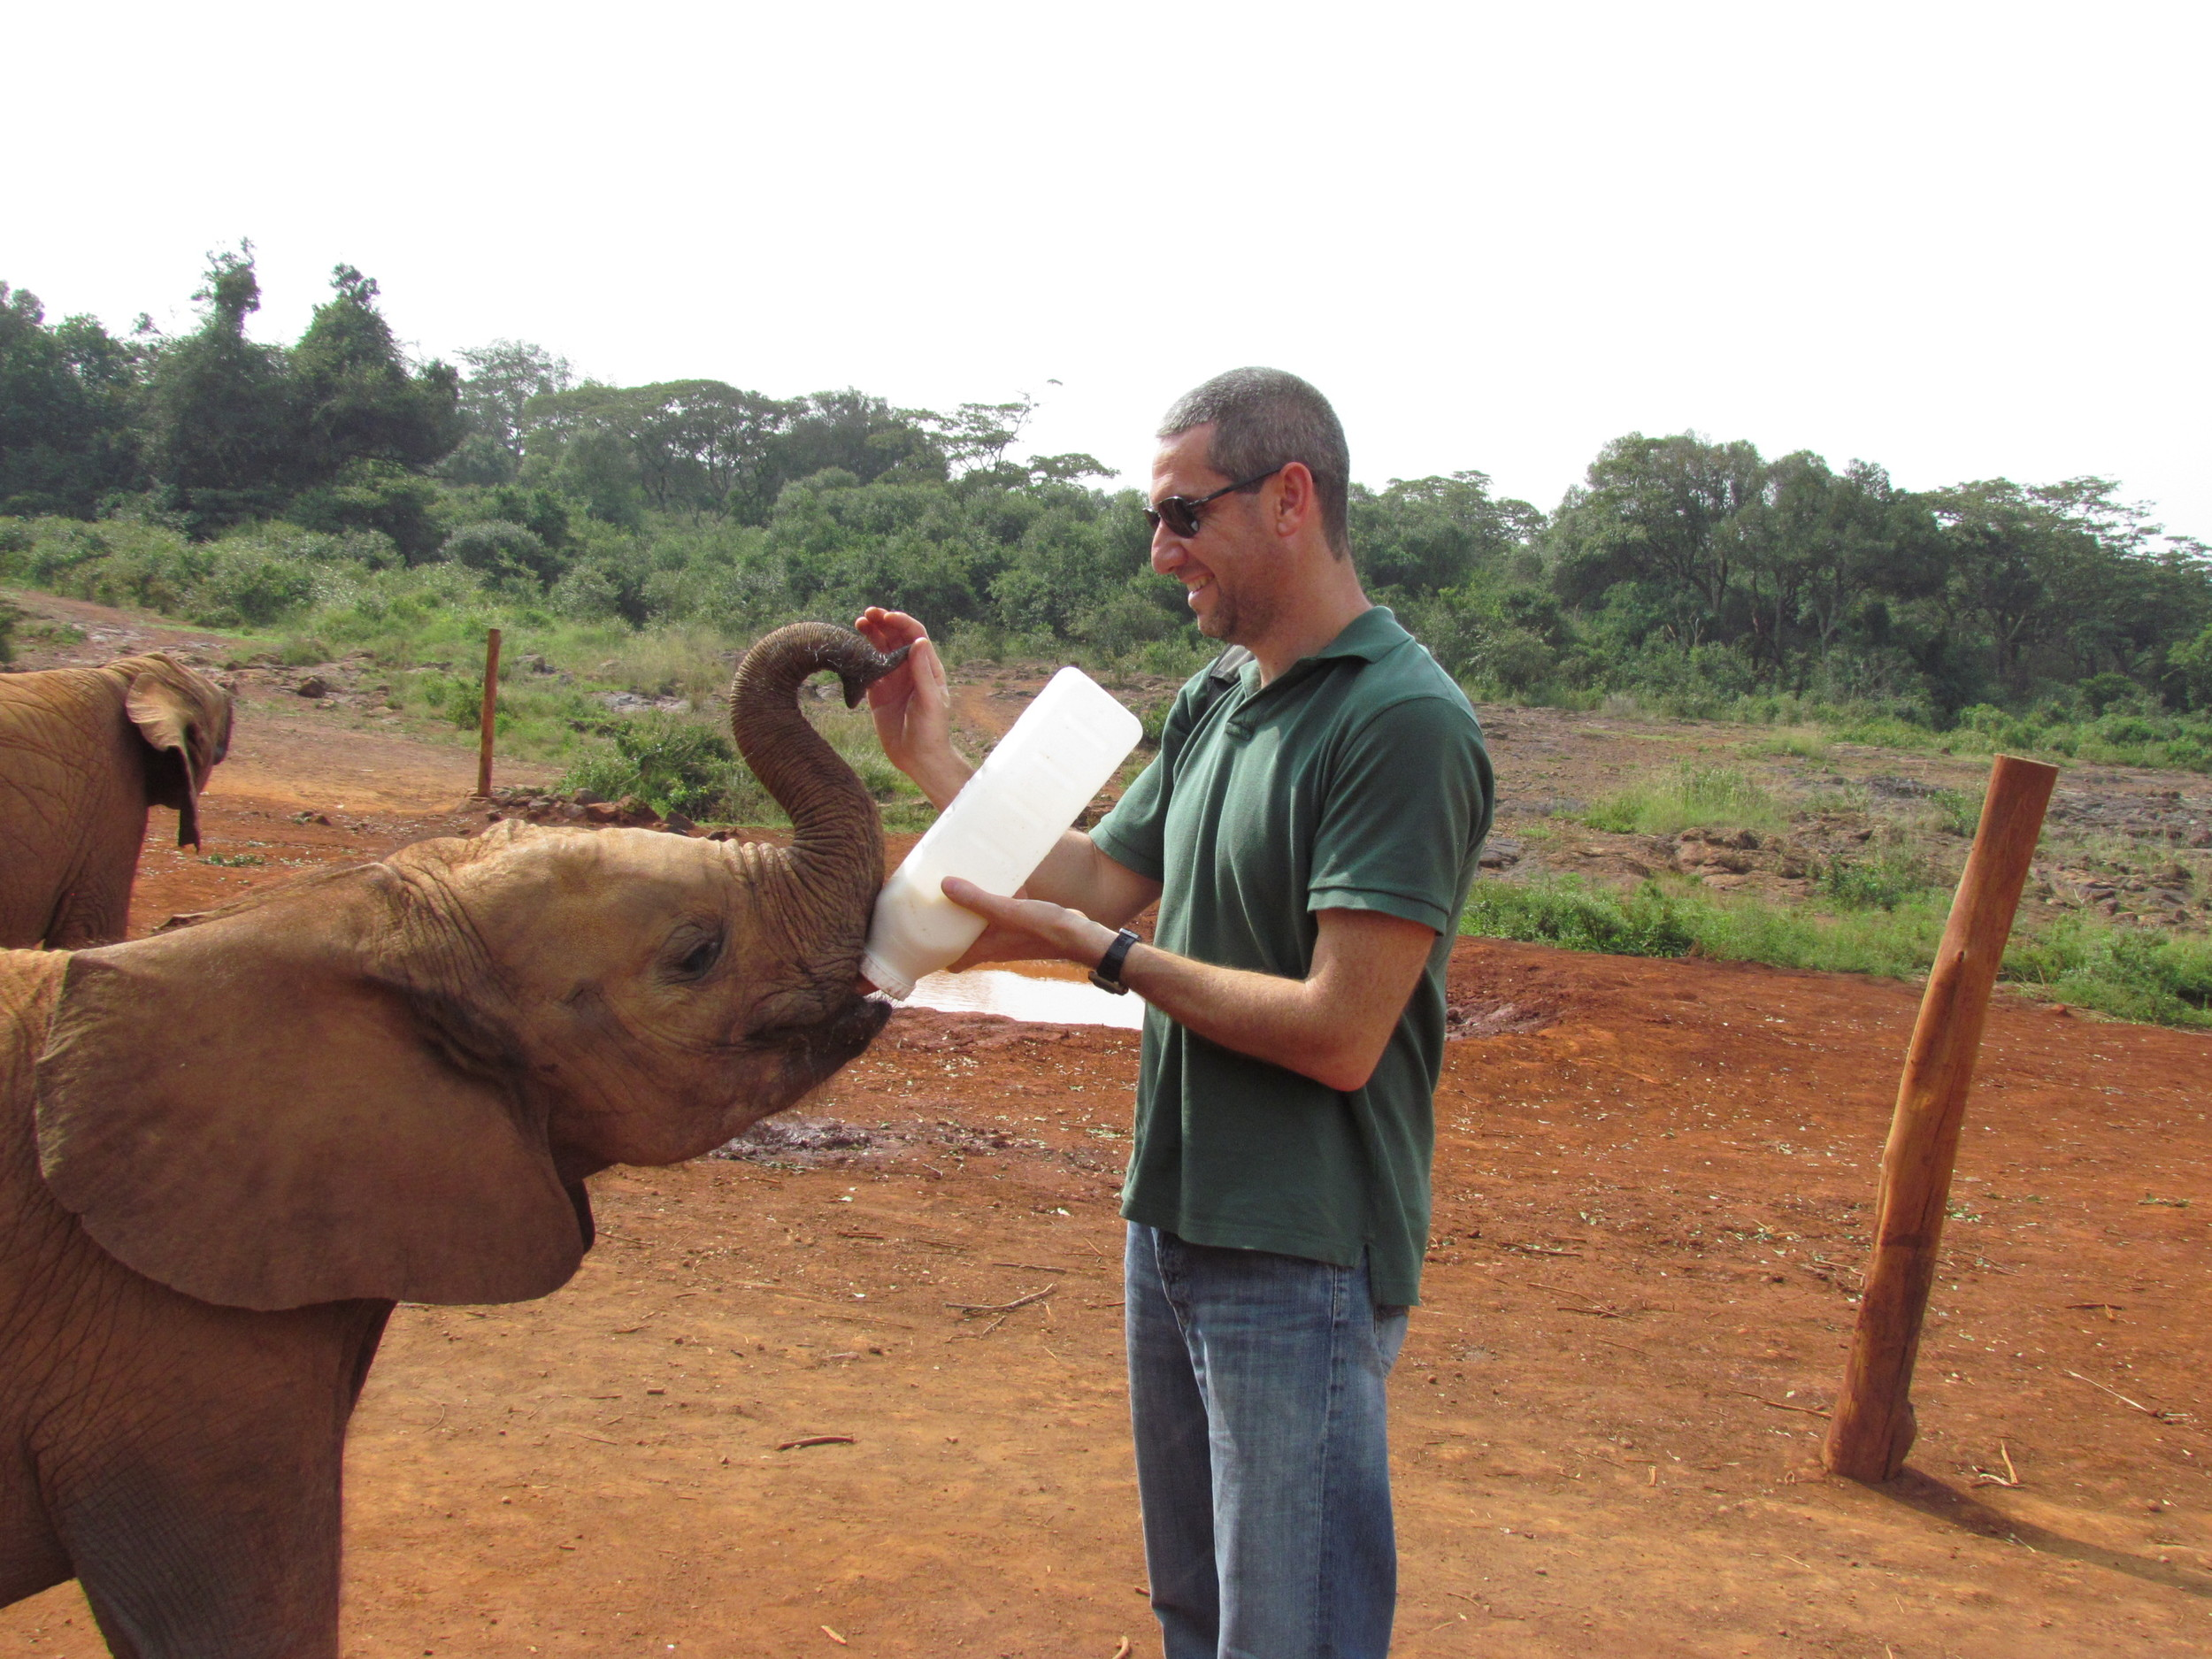 David Sheldrick Wildlife Trust - Nairobi, Kenya 2011